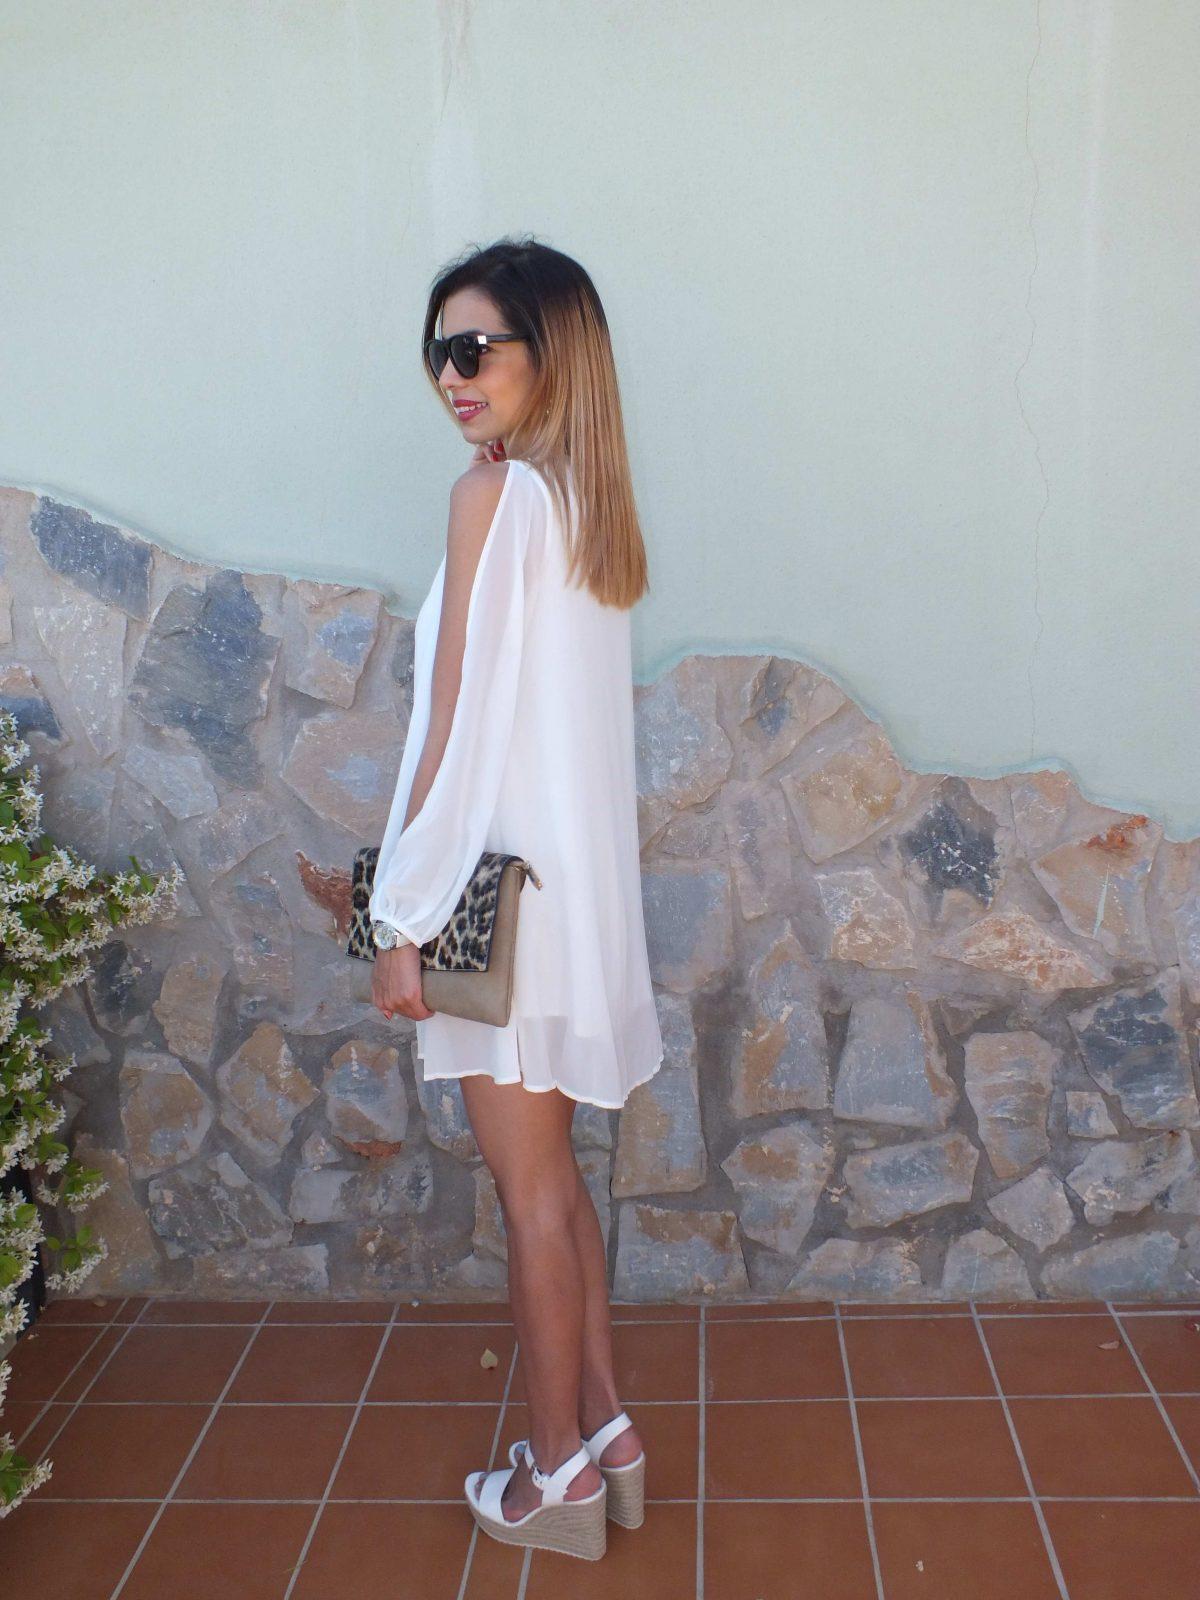 marikowskaya street style angélica vestido vaporoso (3)